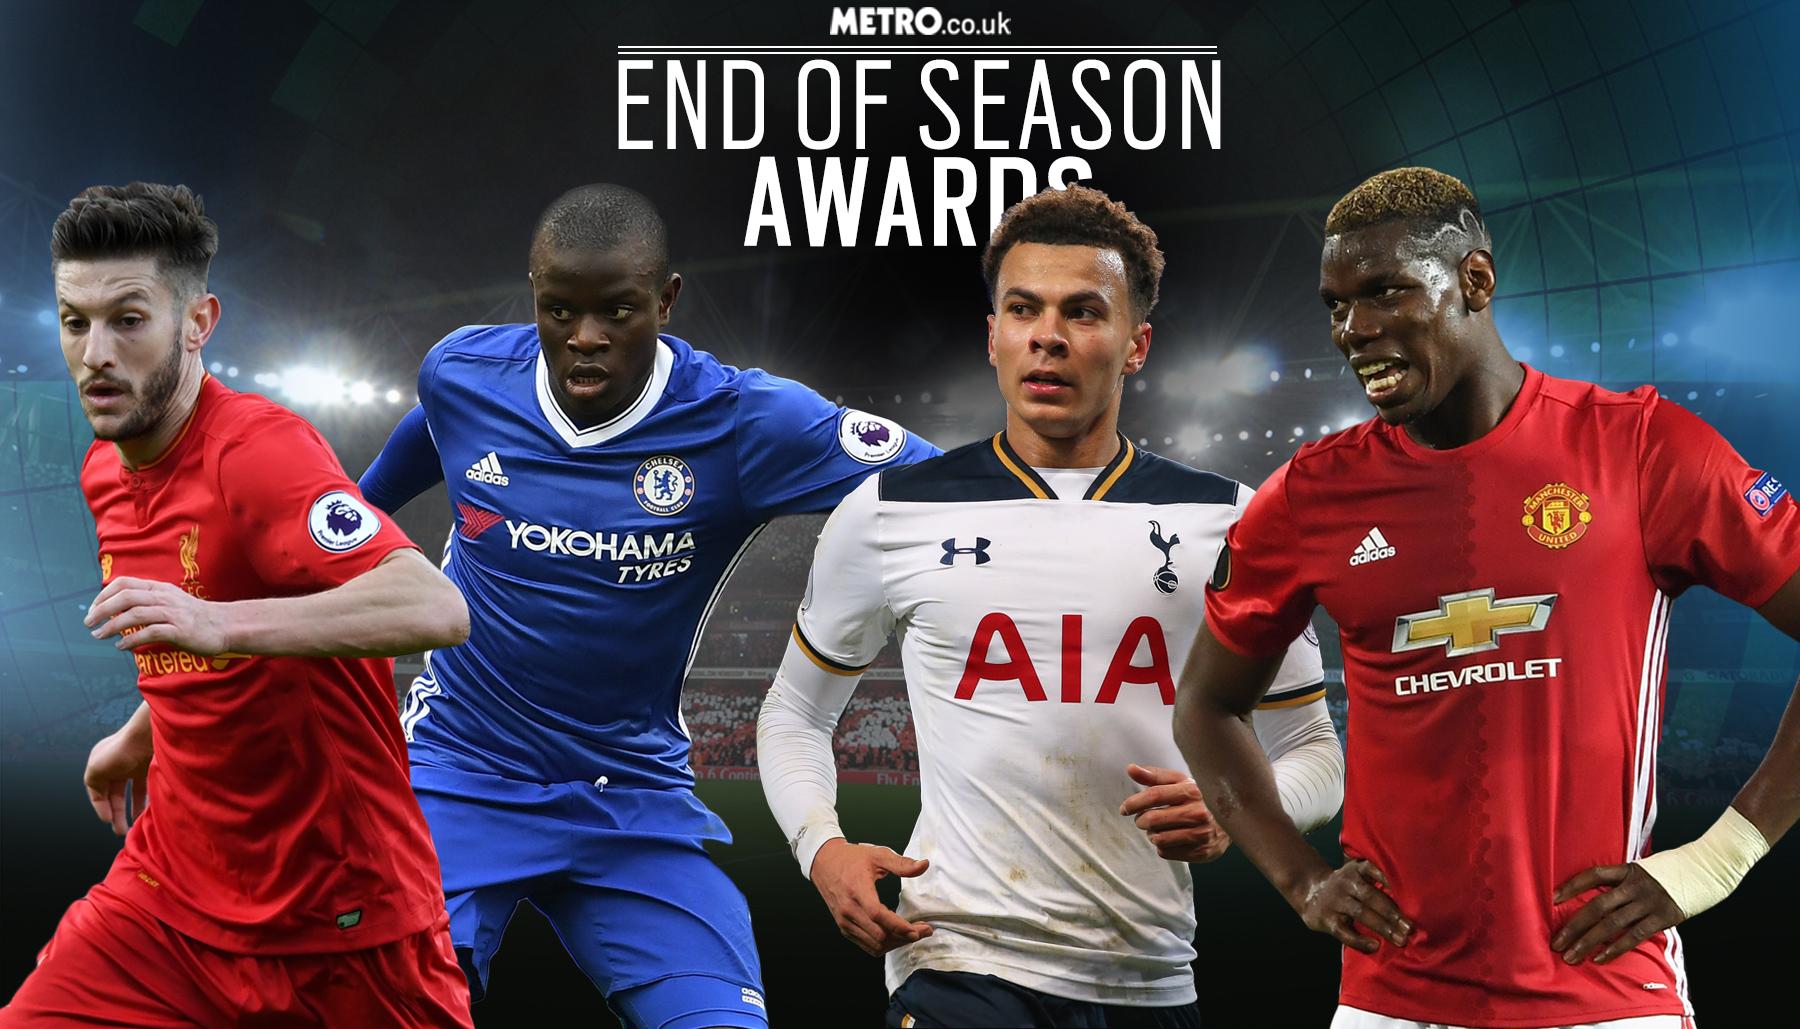 10 best Premier League midfielders of the season, with N'Golo Kante and Paul Pogba